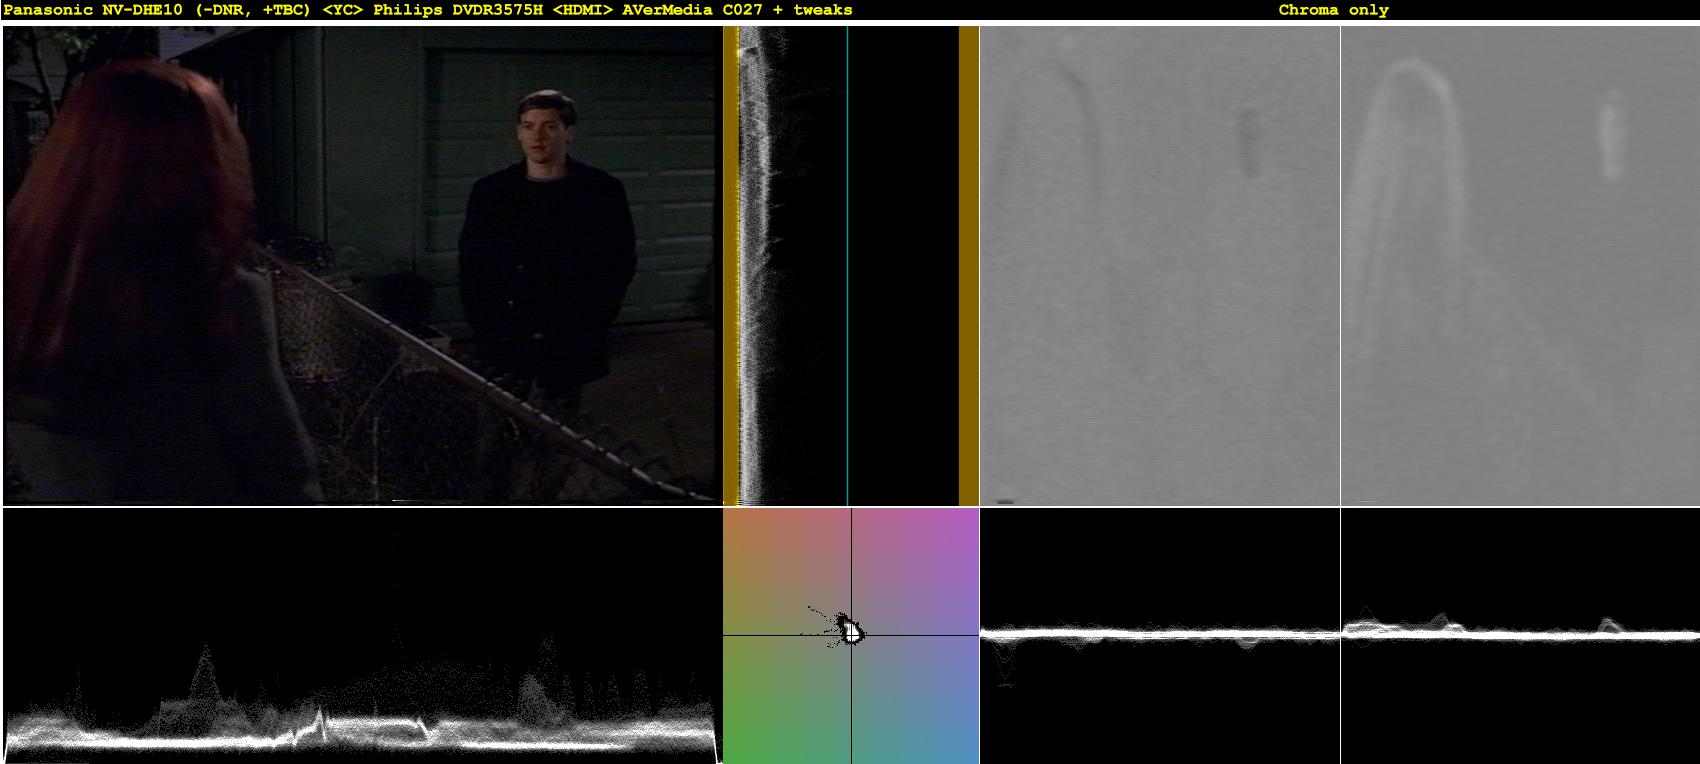 Click image for larger version  Name:0-37-50 - Panasonic NV-DHE10 (-DNR, +TBC).png Views:1081 Size:852.2 KB ID:37993